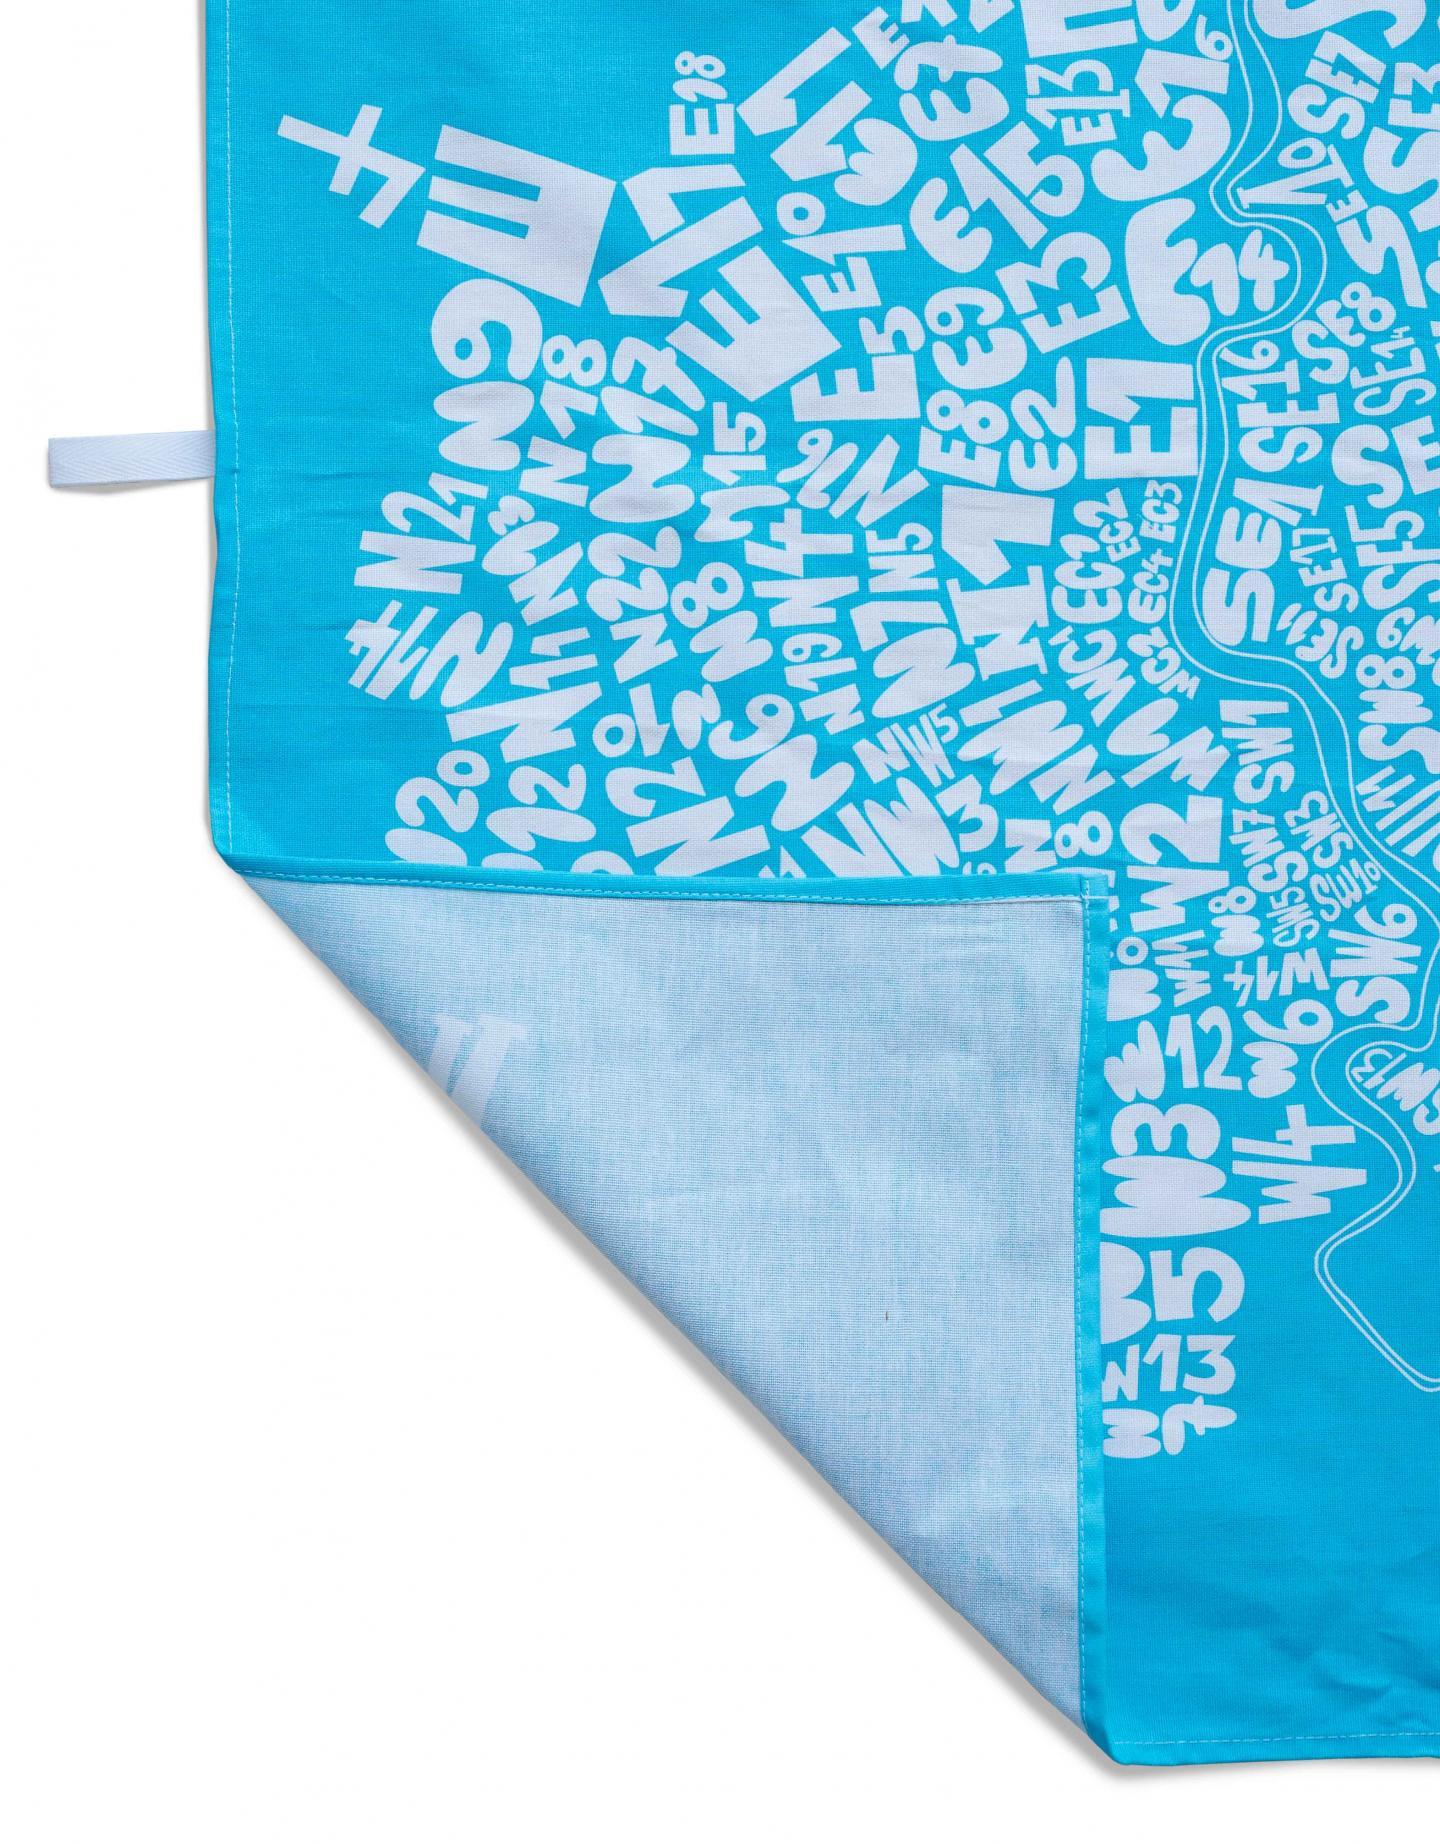 Place in Print South London Prints London Postcodes Tea Towel Blue